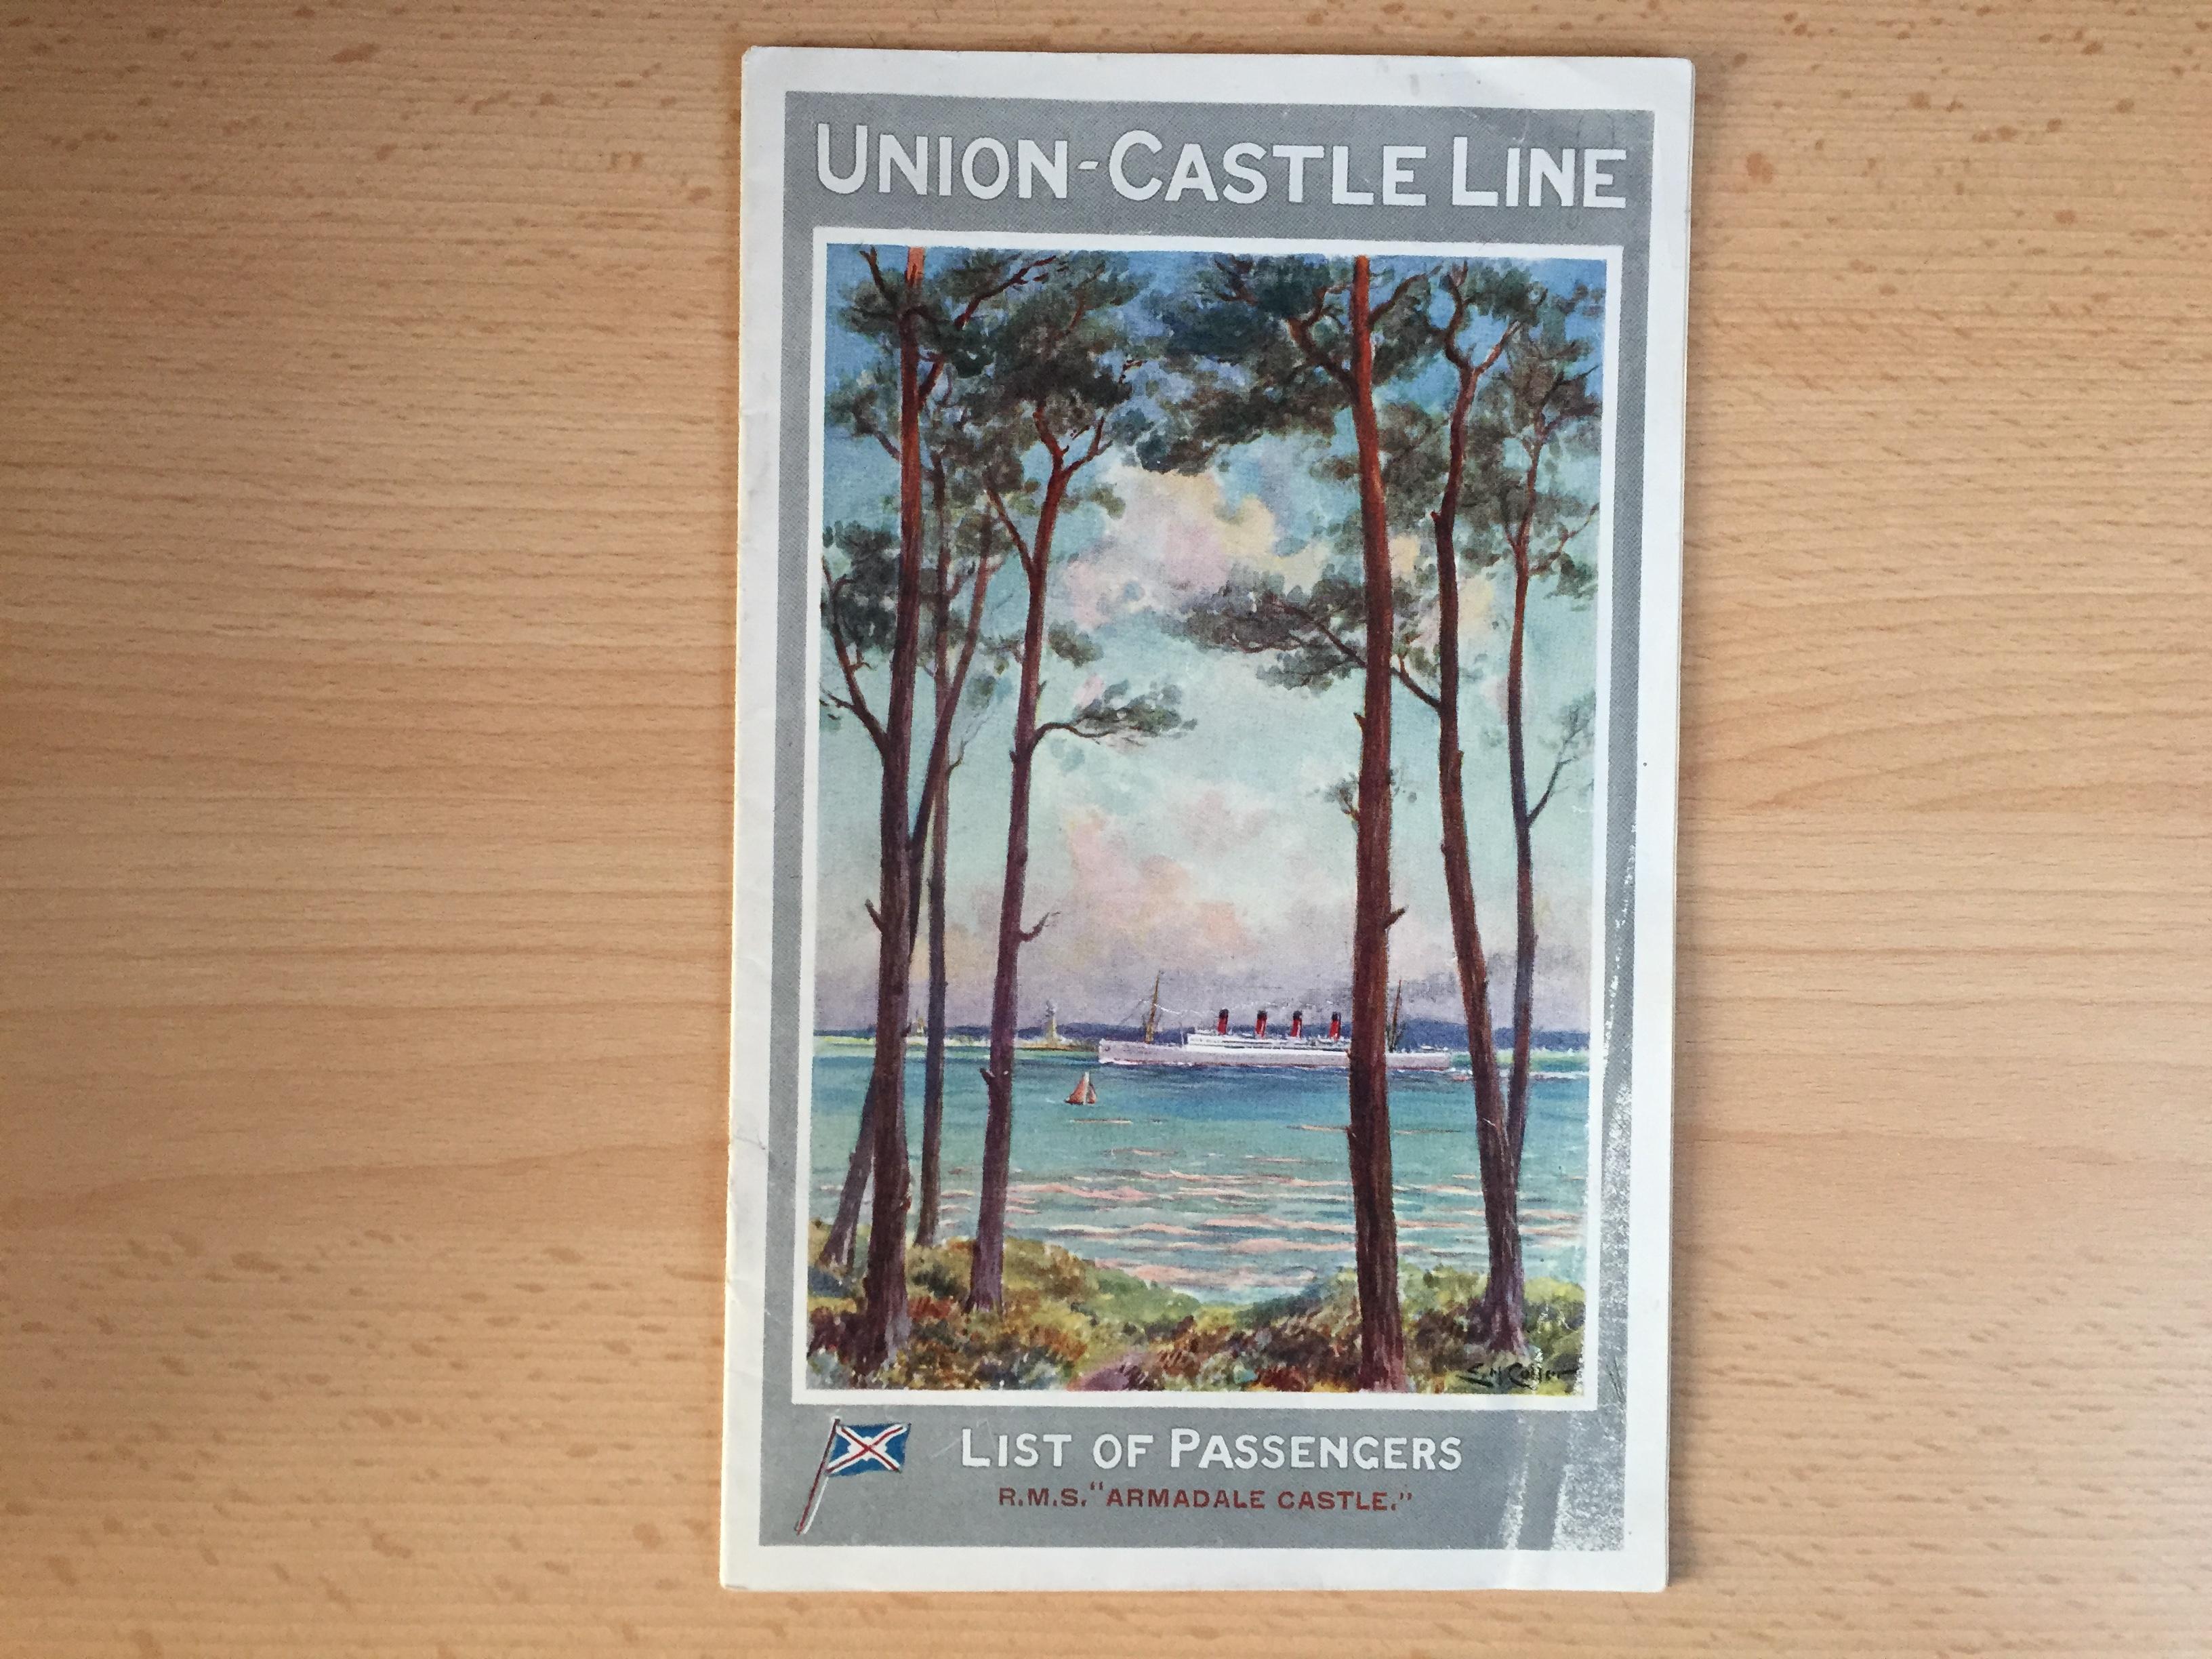 PASSENGER LIST FROM THE UNION CASTLE LINE VESSEL THE ARMADALE CASTLE DATED 1924